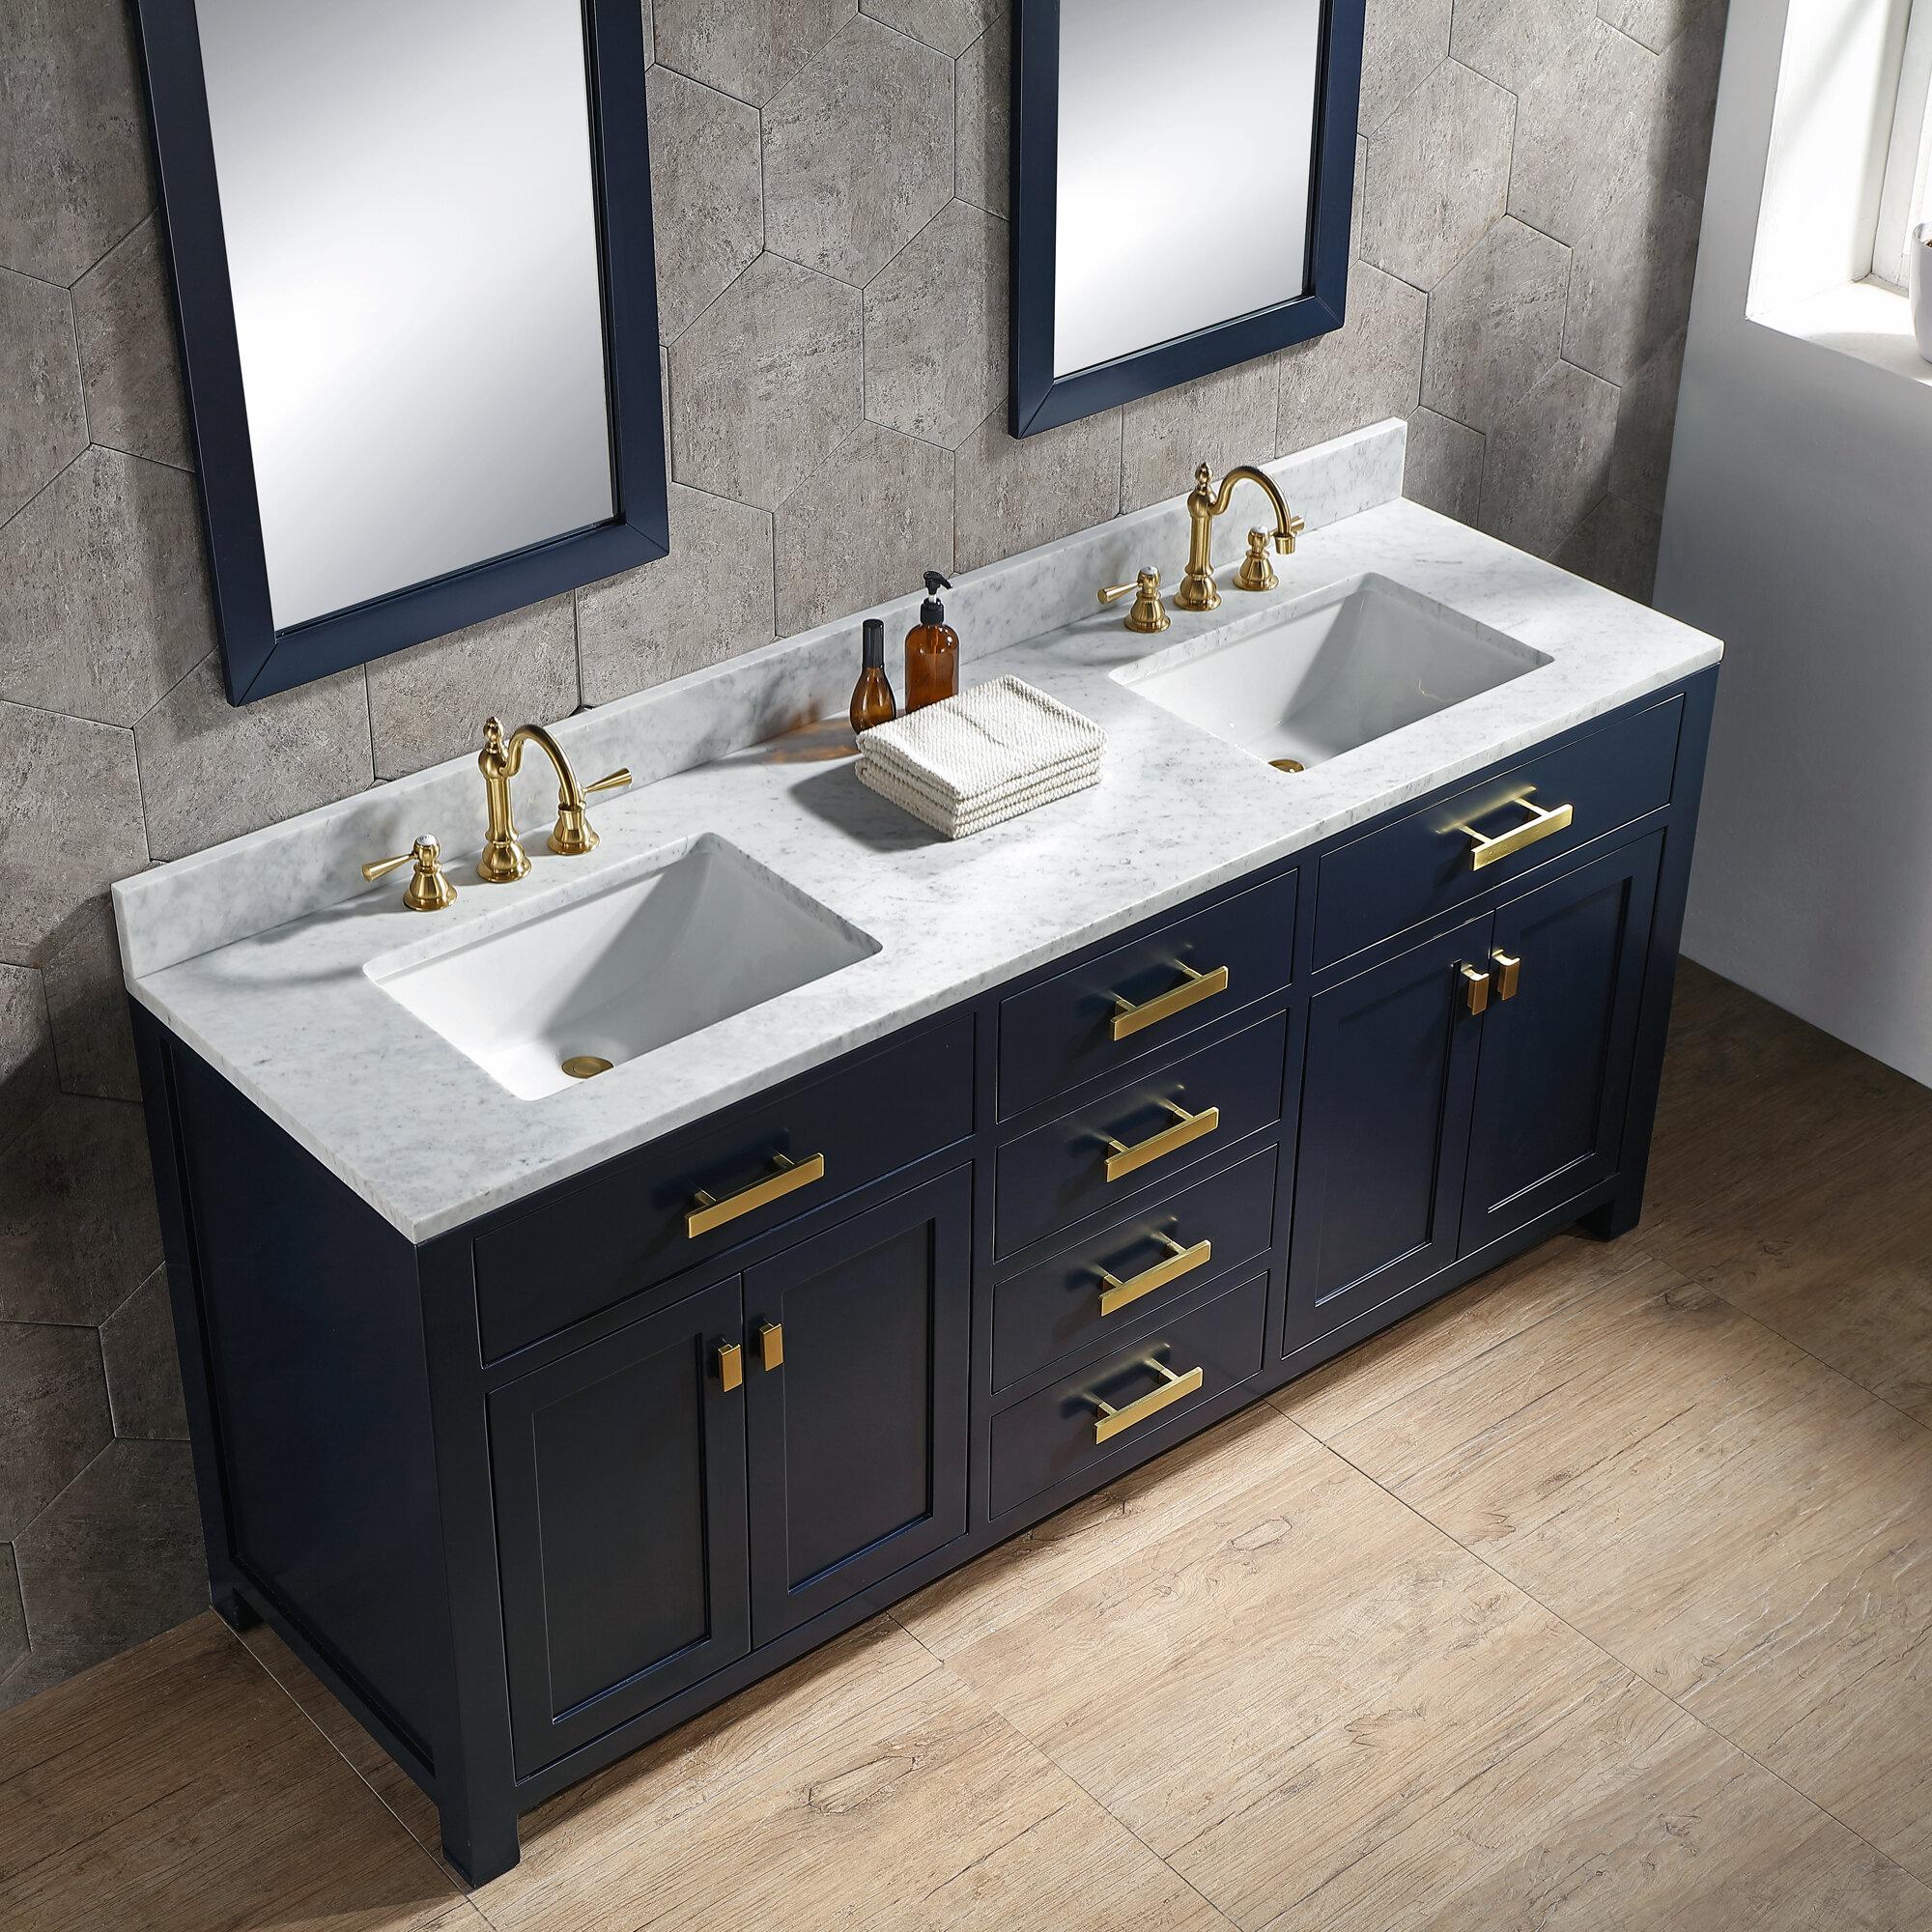 Longshore Tides Okanogan 72 Double Bathroom Vanity Set Reviews Wayfair